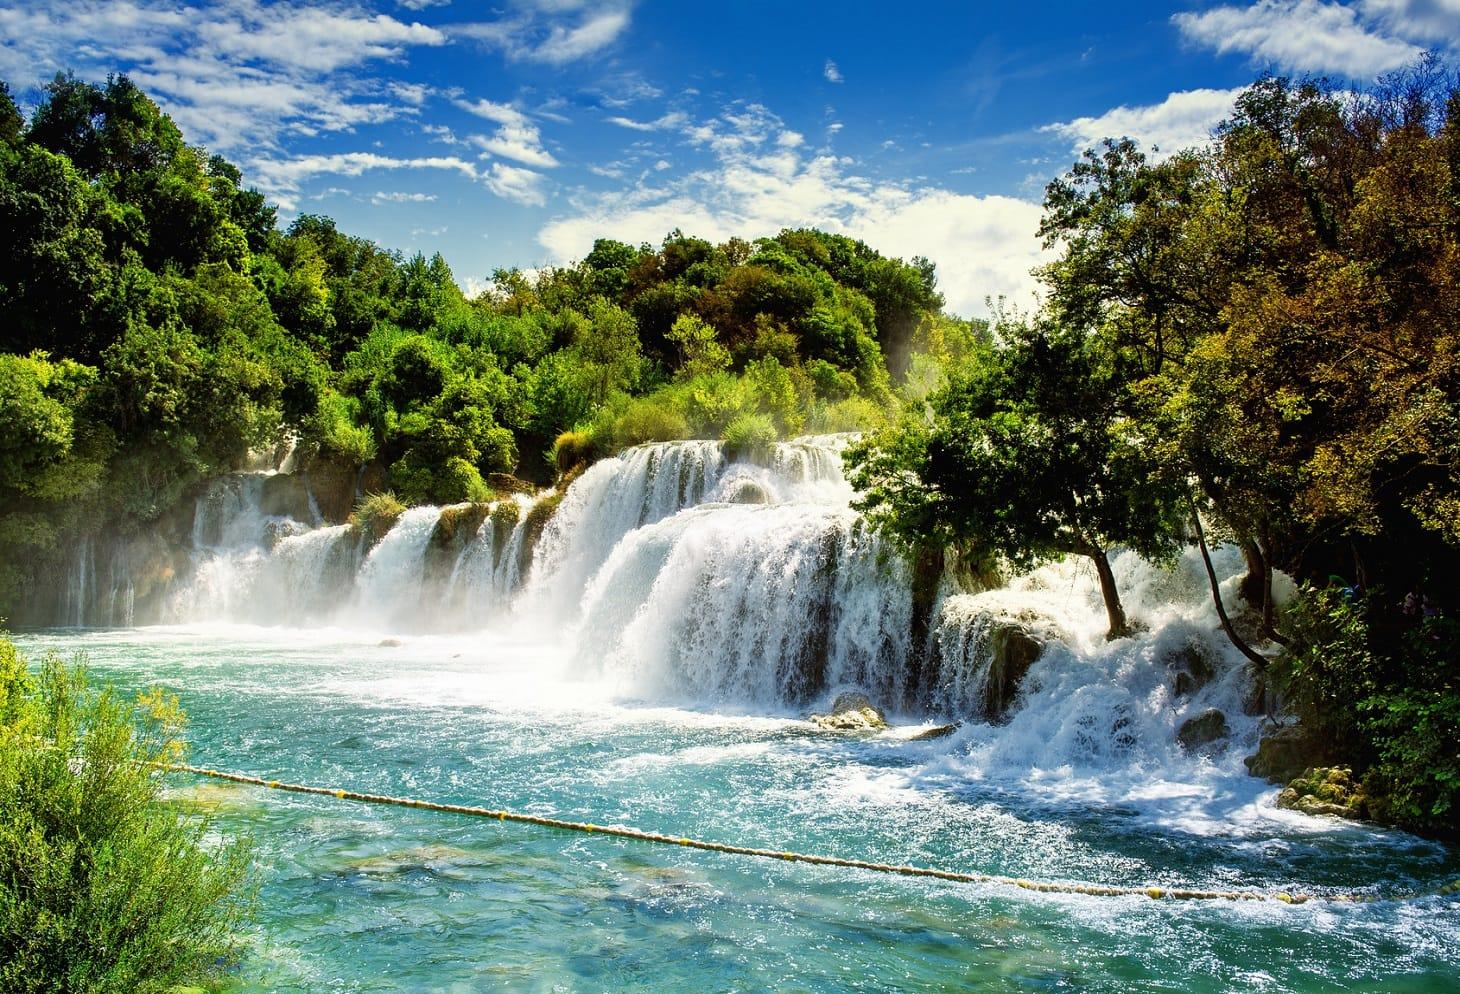 Iguazul Falls Wallpaper Nature Sounds Influence People S Physiology